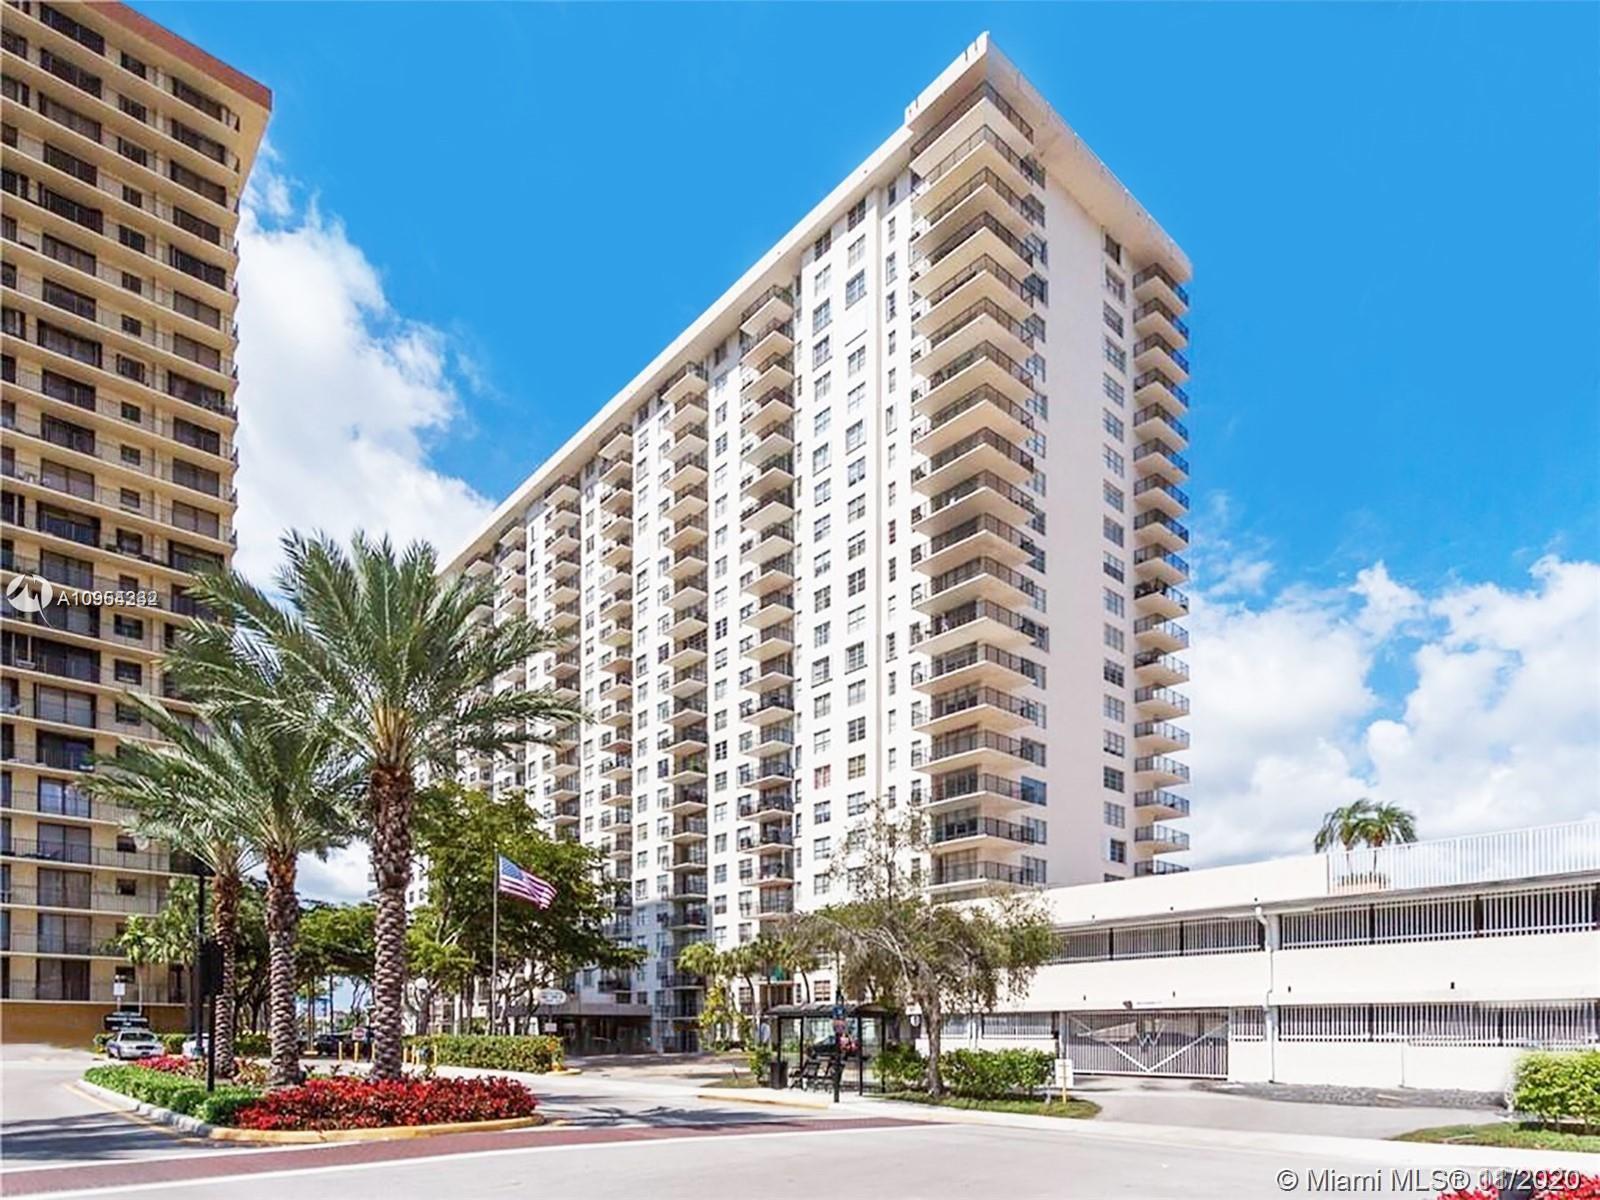 Winston Tower 500 #605 - 301 174th St #605, Sunny Isles Beach, FL 33160